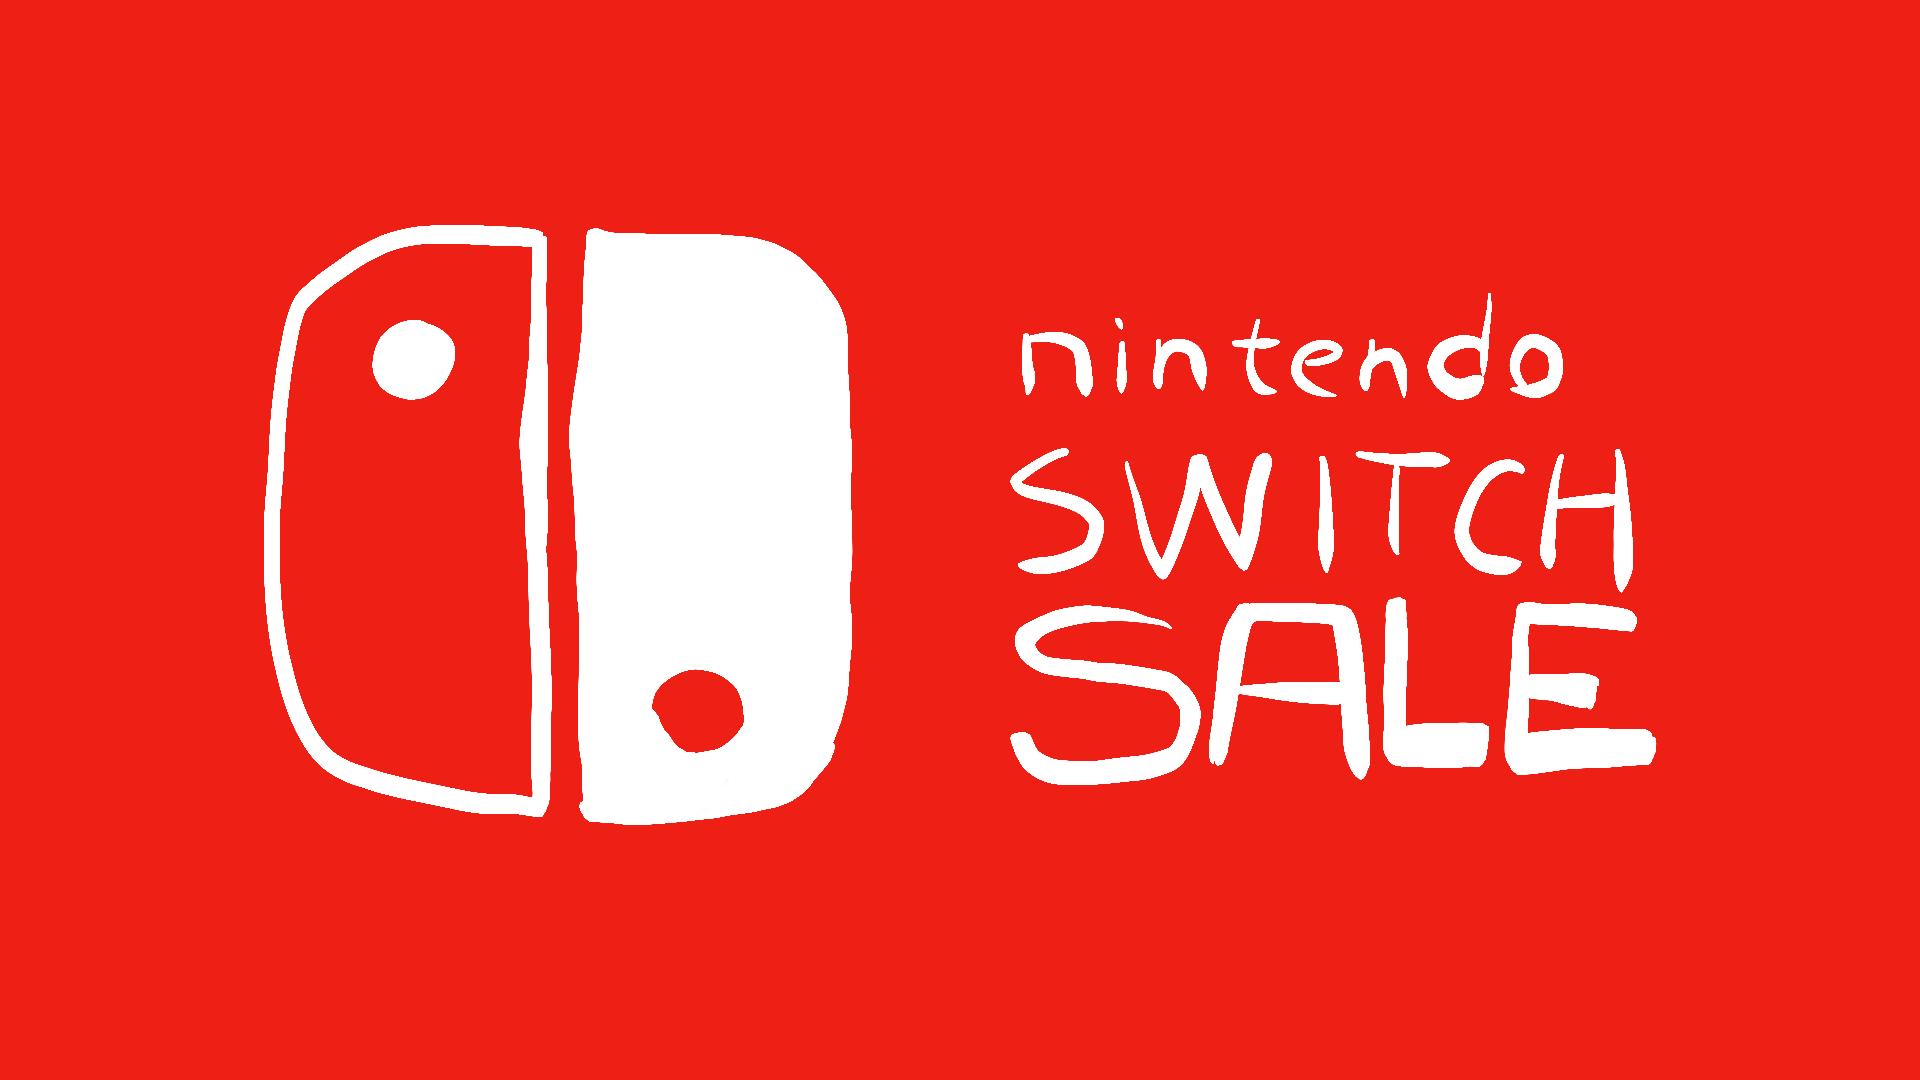 Nintendo Switchのセールが熱い